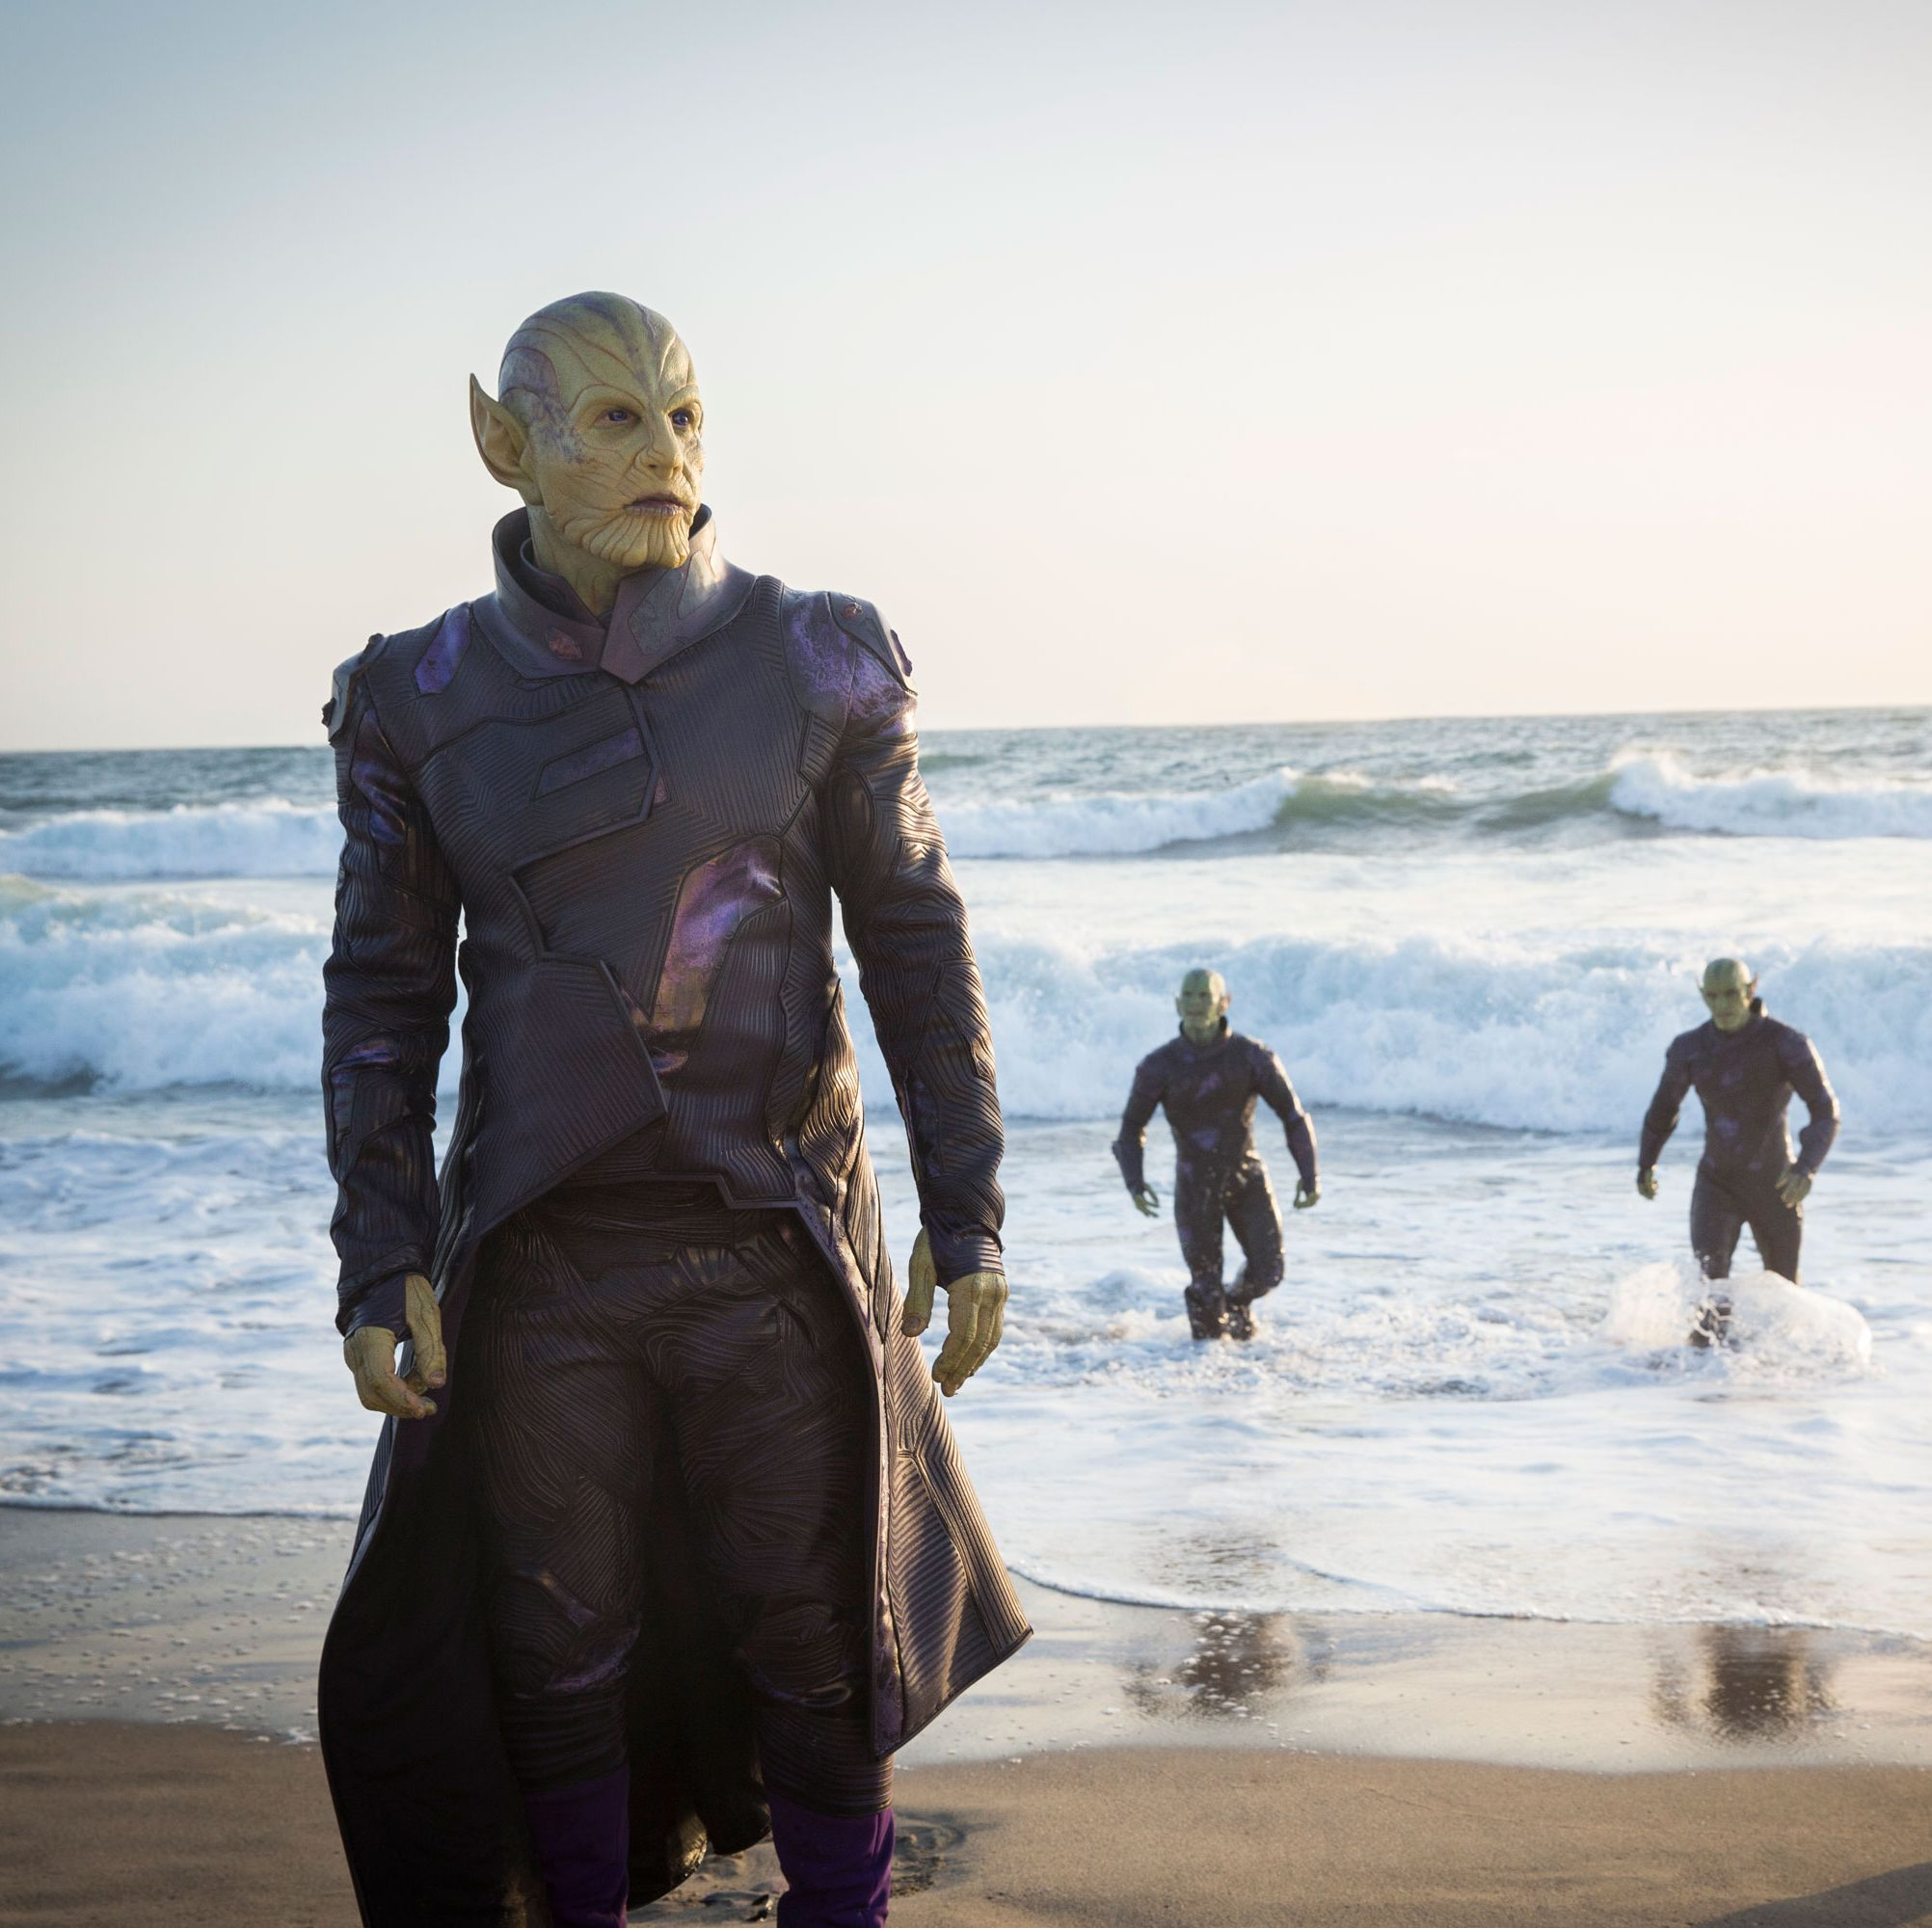 Marvel boss Kevin Feige says Captain Marvel doesn't rule out Secret Invasion